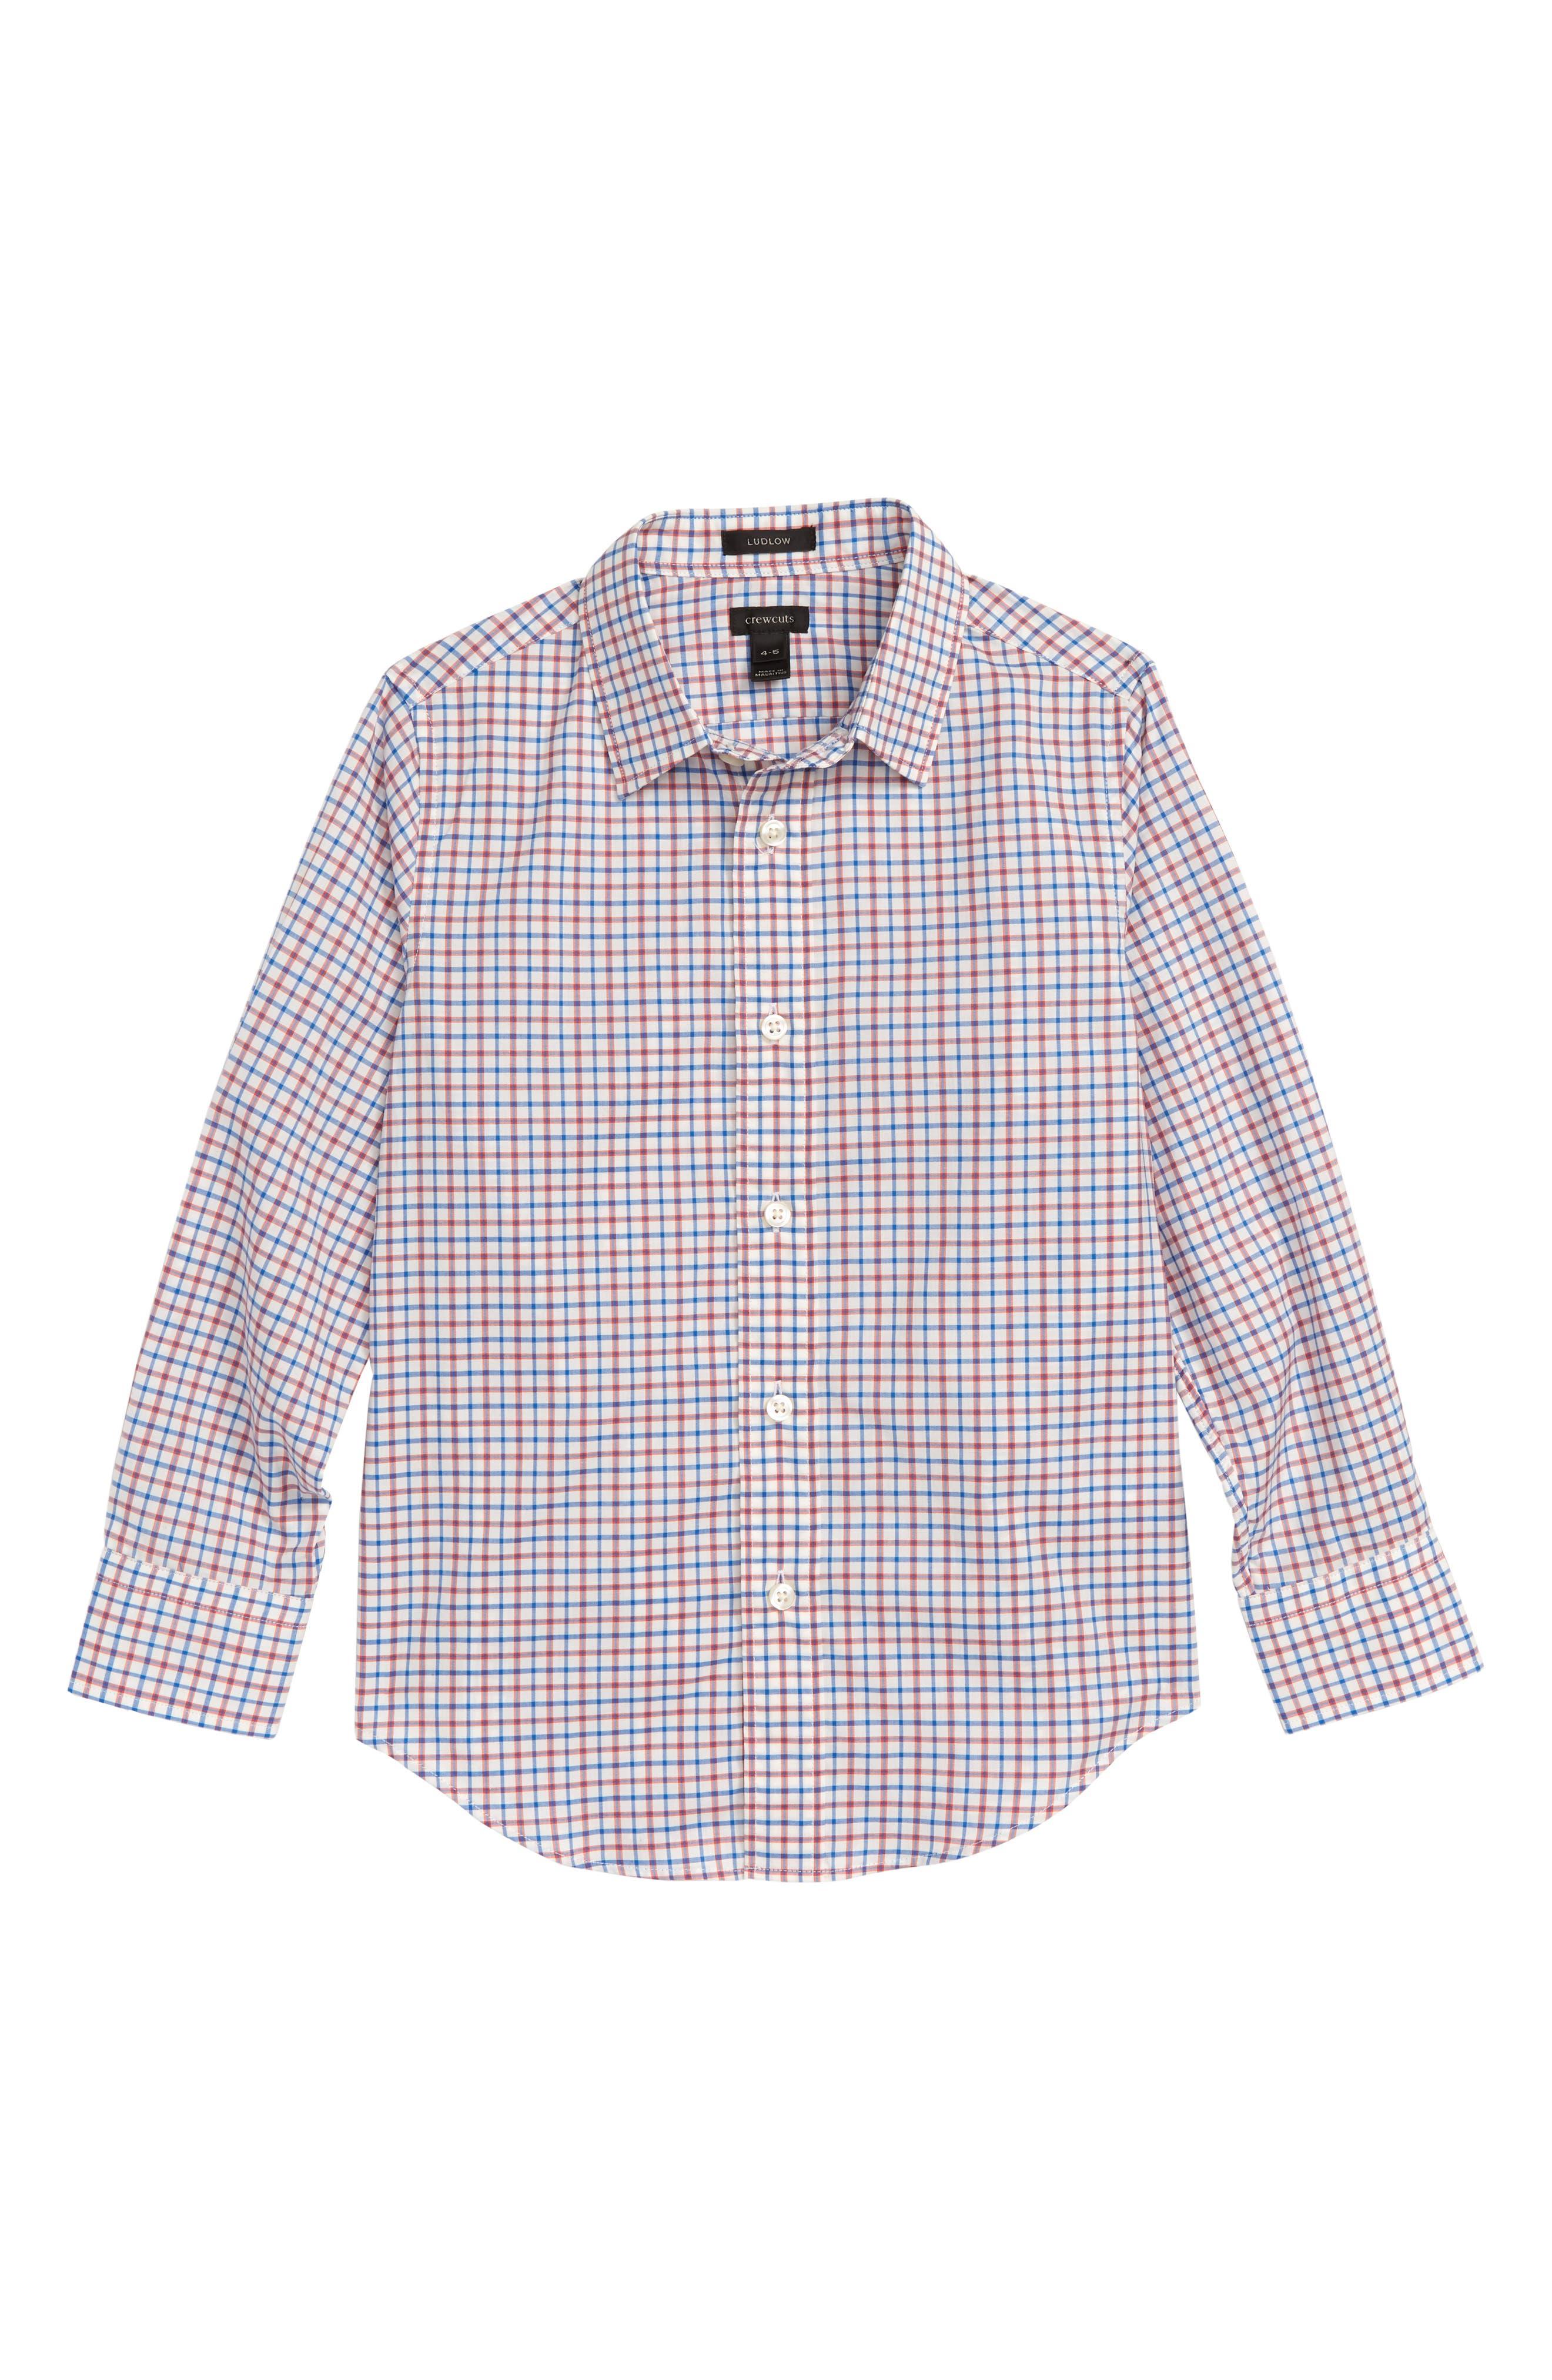 Ludlow Stripe Dress Shirt,                         Main,                         color, Ivory Poppy